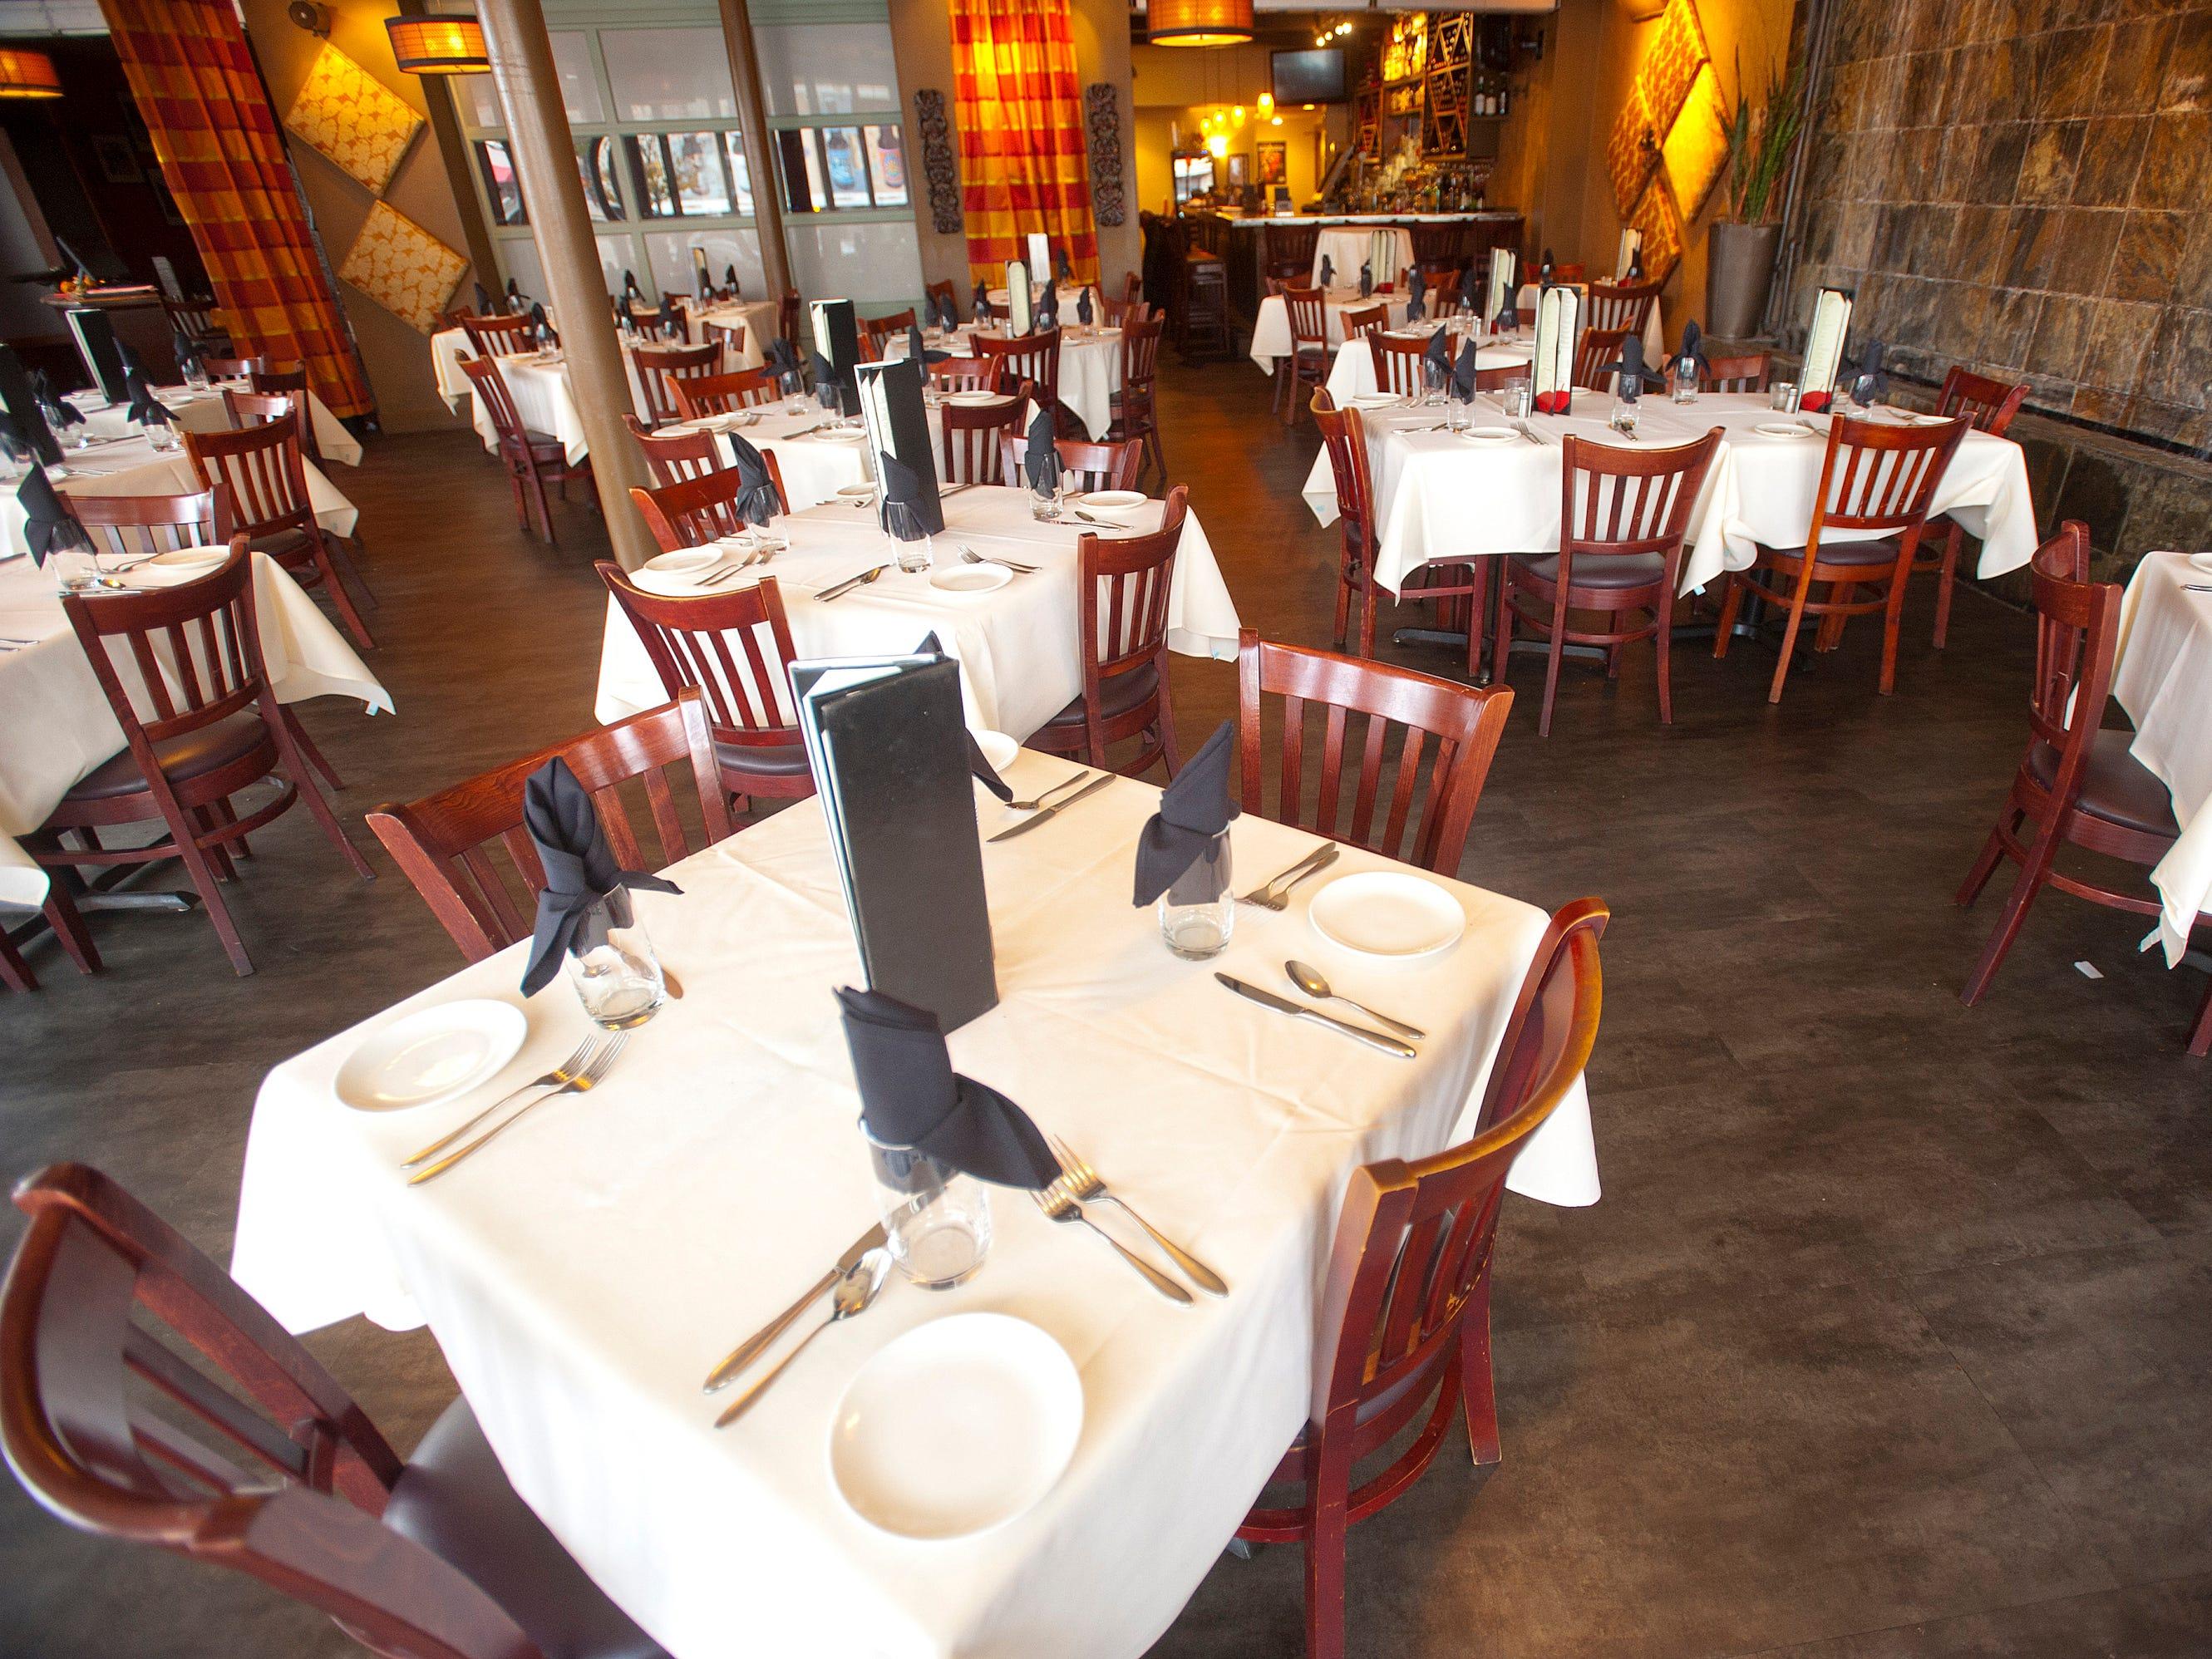 The dining room of the Varanese Restaurant on Frankfort Ave.November 14, 2018